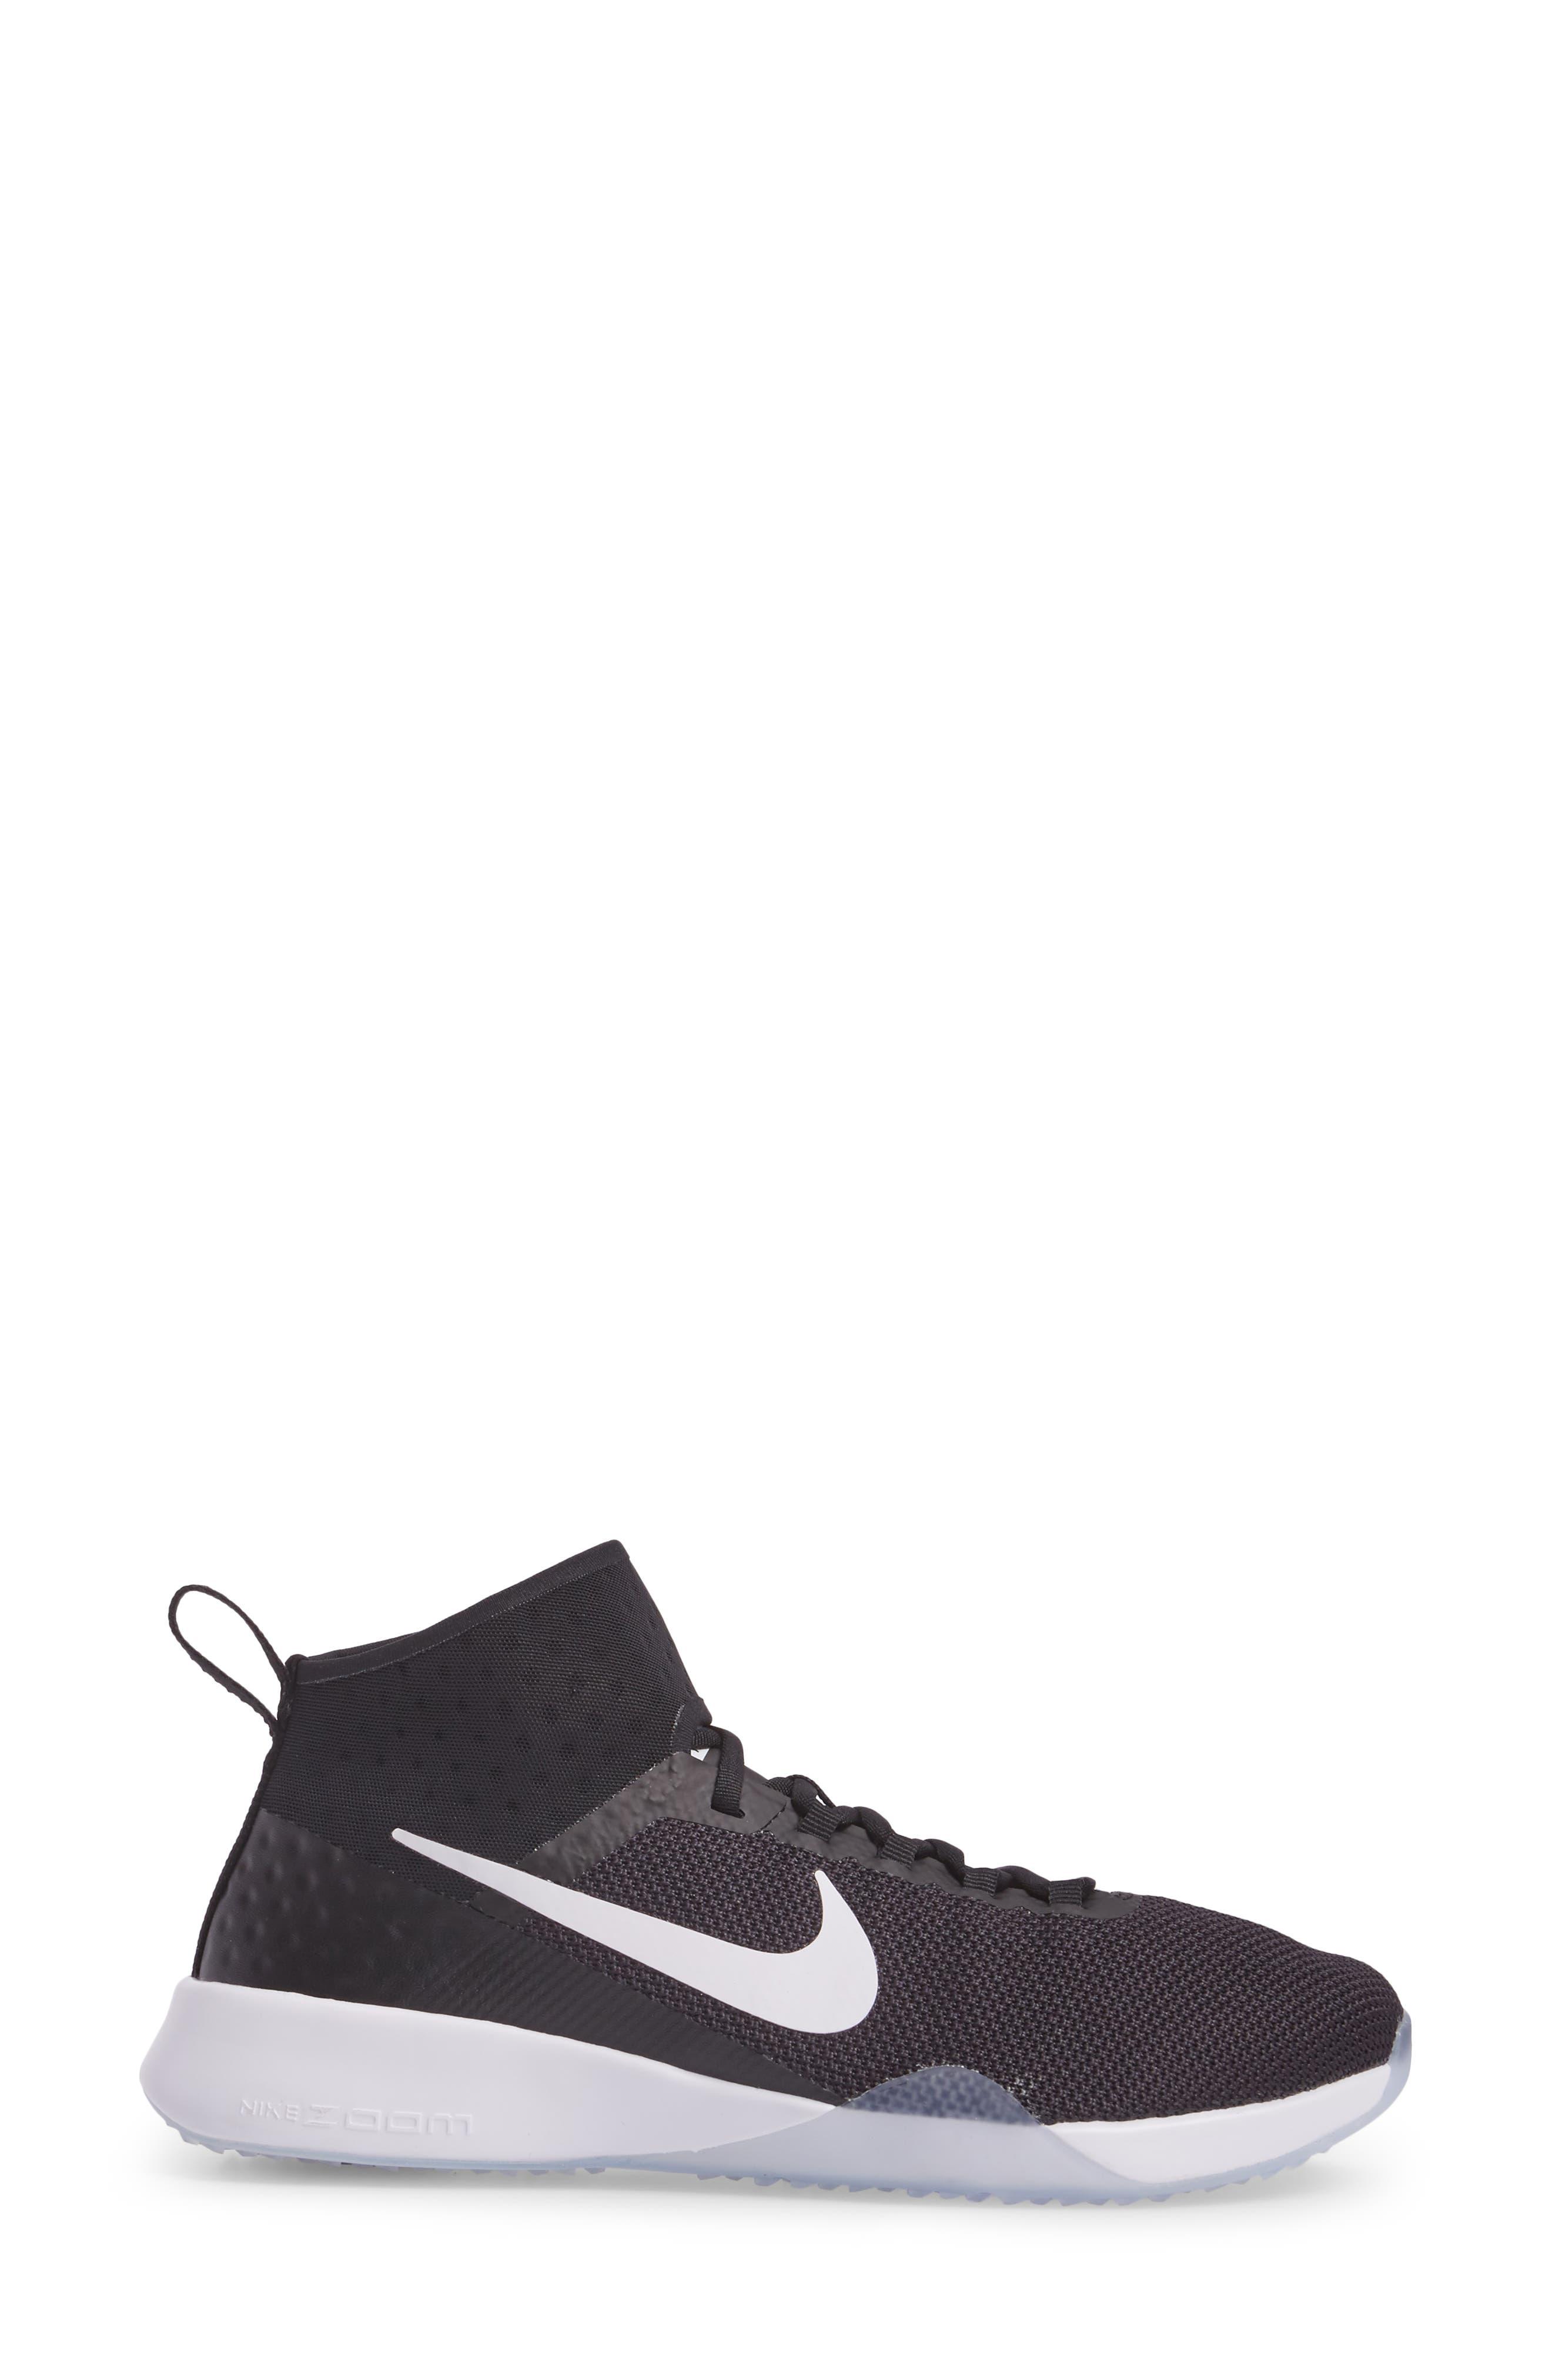 NikeLab Air Zoom Strong 2 Training Shoe,                             Alternate thumbnail 3, color,                             Black/ White